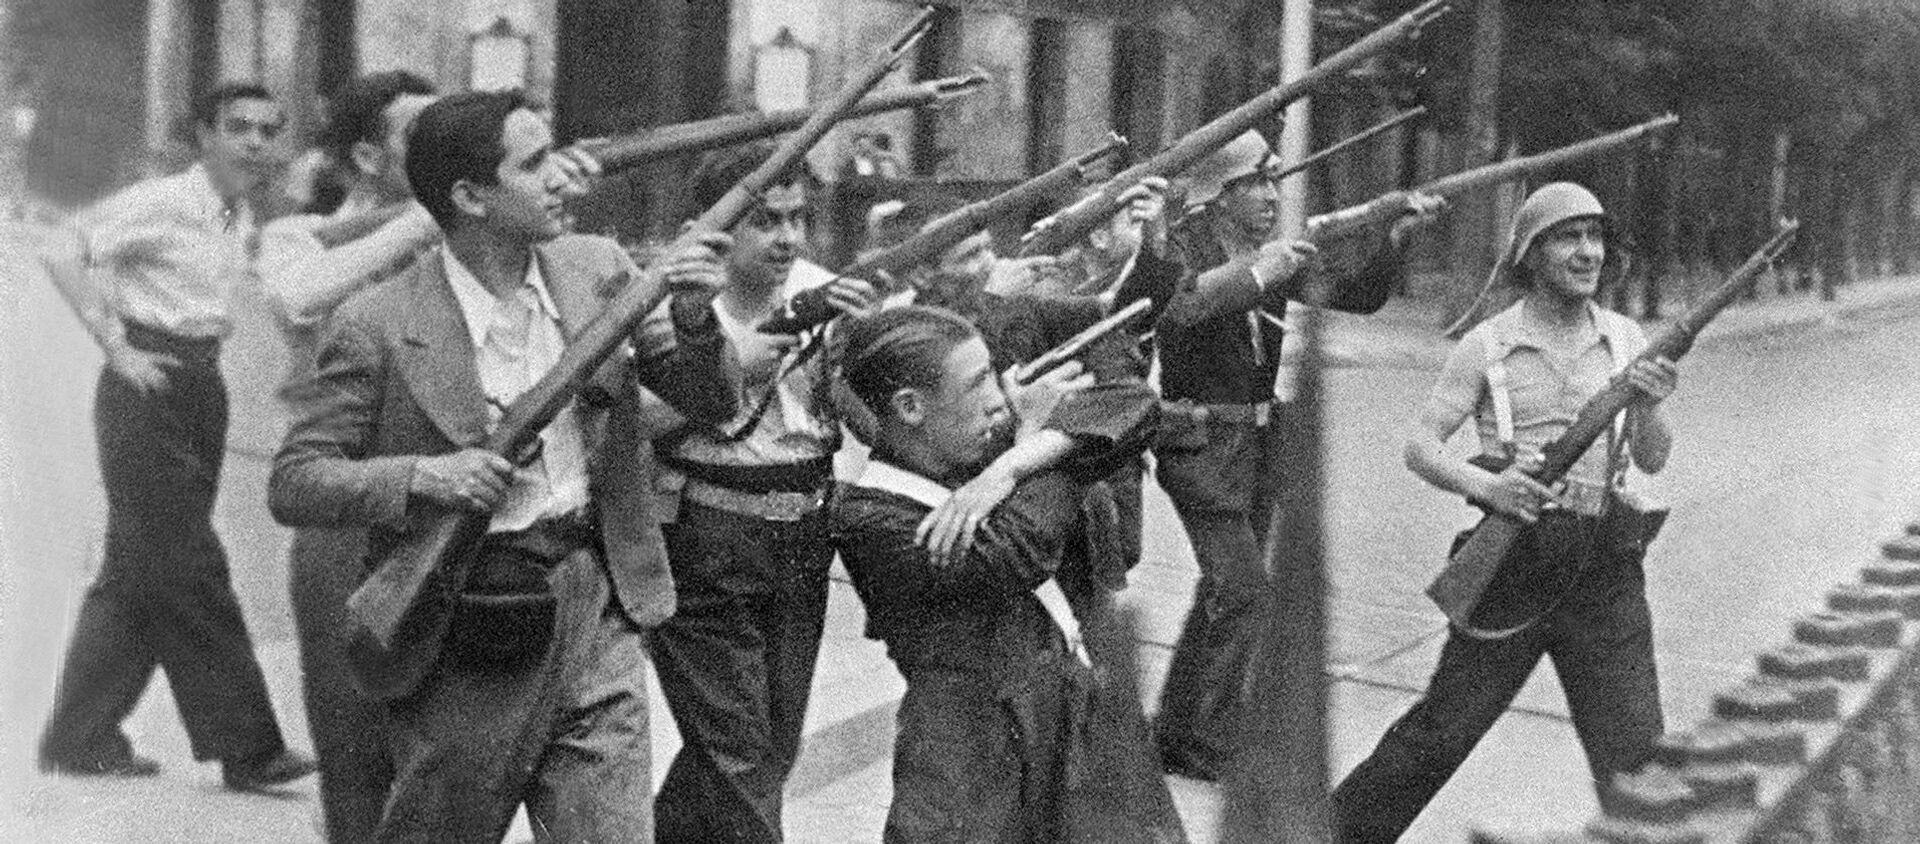 Guerra Civil en España (archivo) - Sputnik Mundo, 1920, 10.08.2020